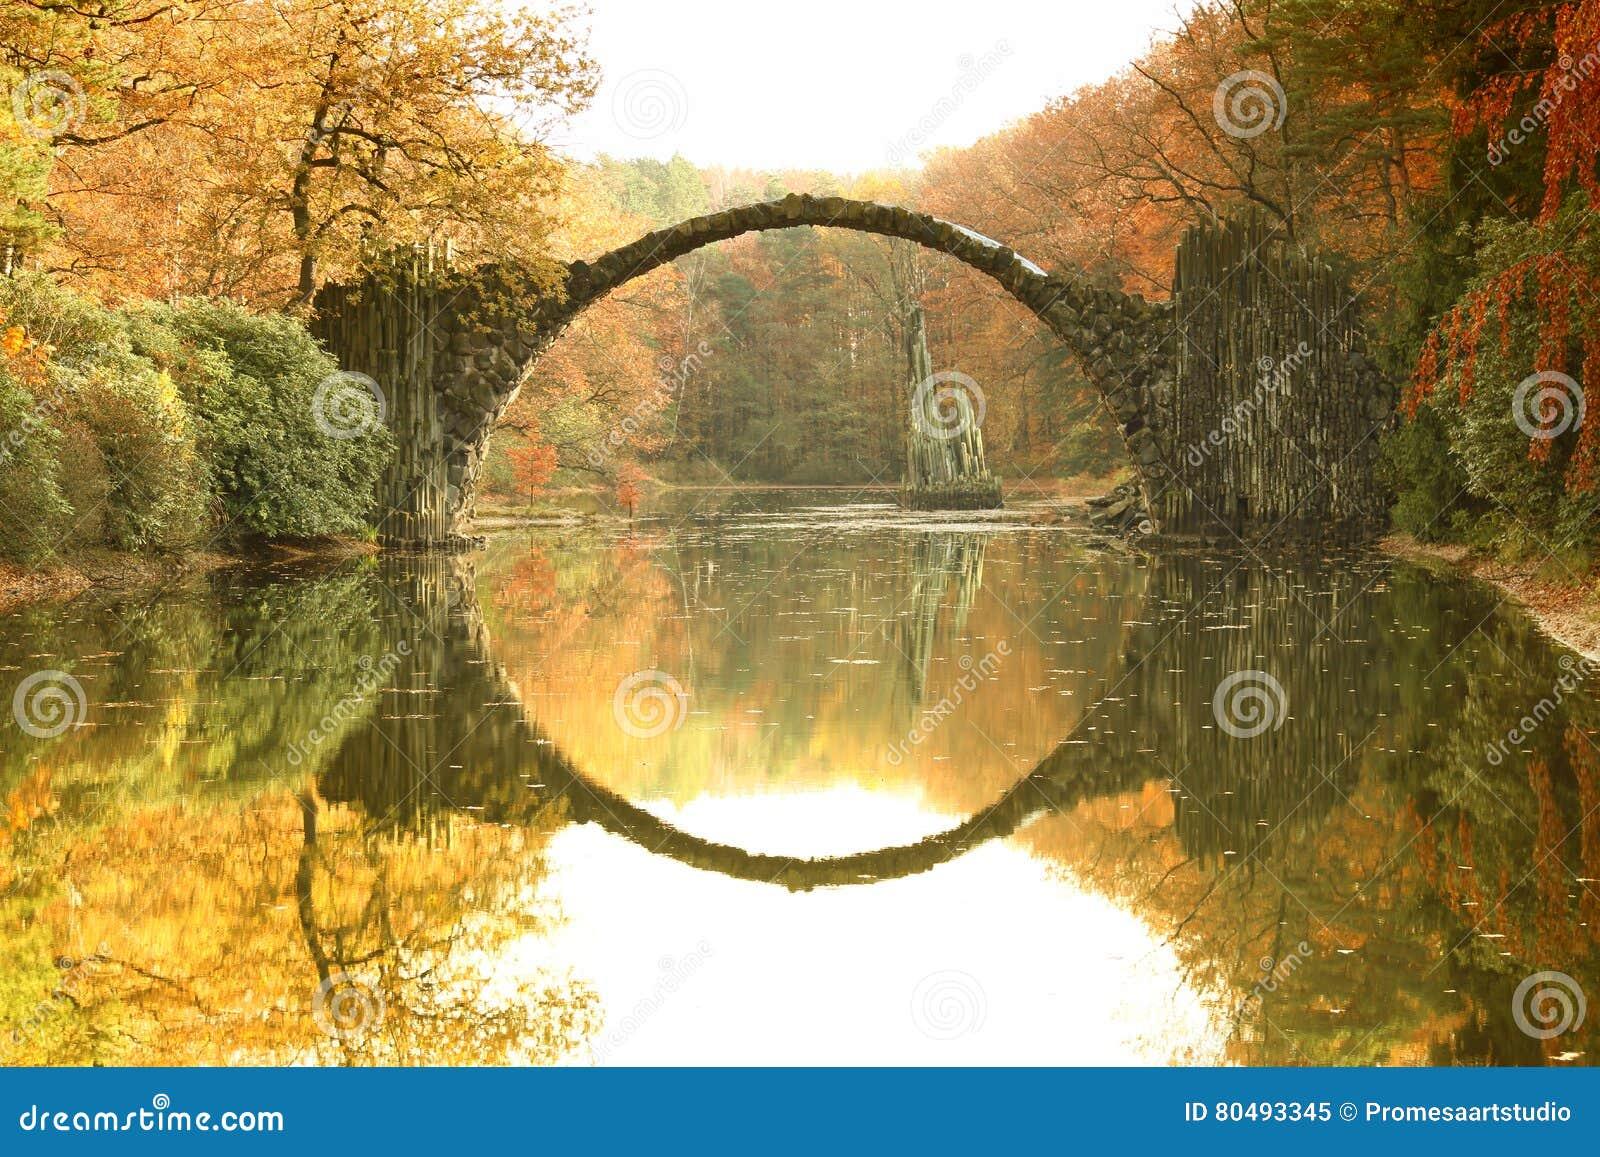 Pont Rakotzbrucke Pont De Rakotz Du S De Diable Dans Kromlau Saxe Photo Stock Image 80493345